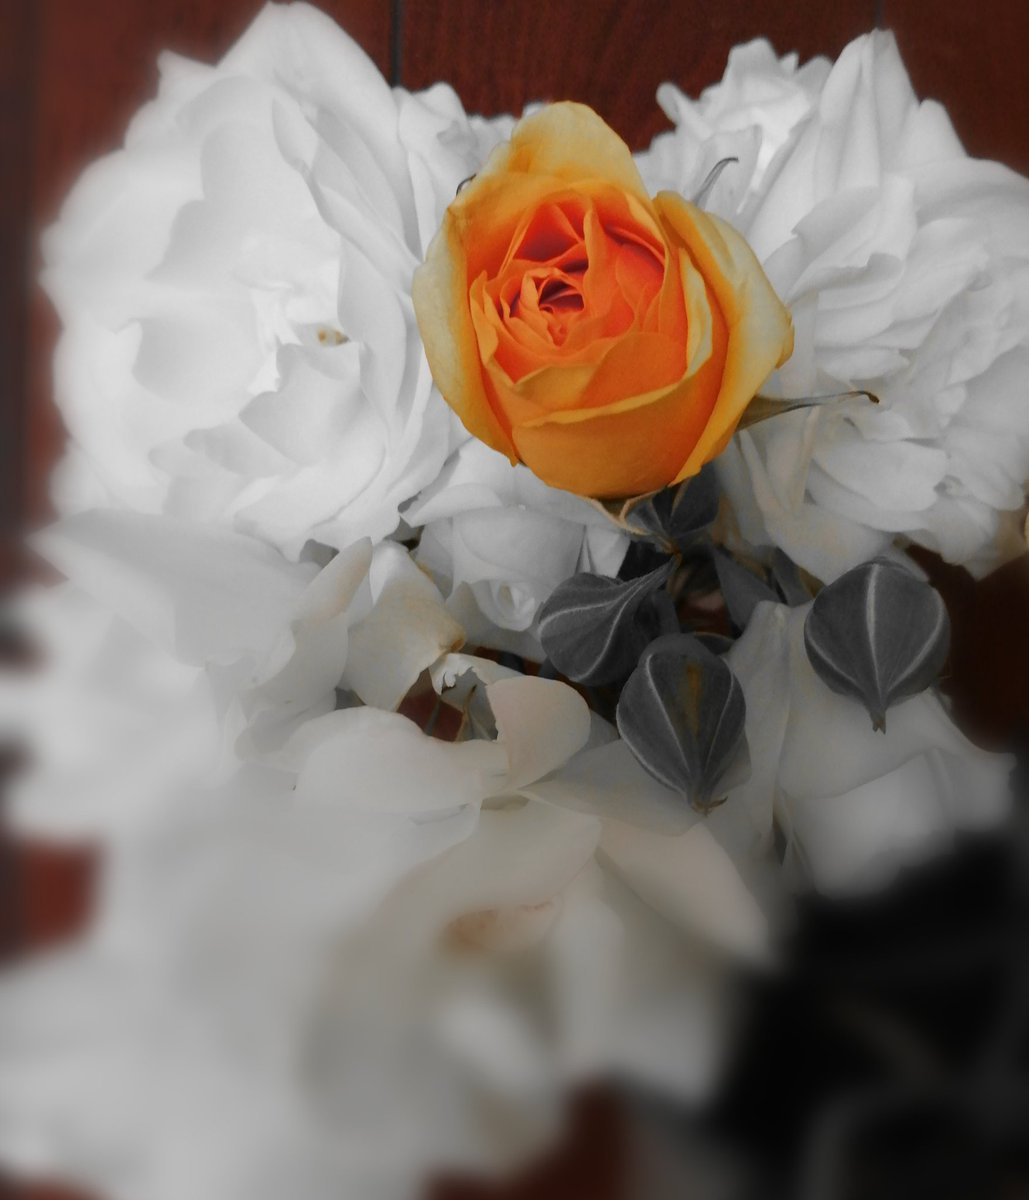 🌎 💙 💚 💛 🧡 ❤️  #LoveandLight #Changes the #World One #Heart At a Time 🌀💙🌀 #PeaceAndLove #Harmony #BeLove  #ShineyourLight #ShineOn #Awakening #ShinelikeDay🙏 #Newbeginnings #Joy #Happiness #Namaste🙏